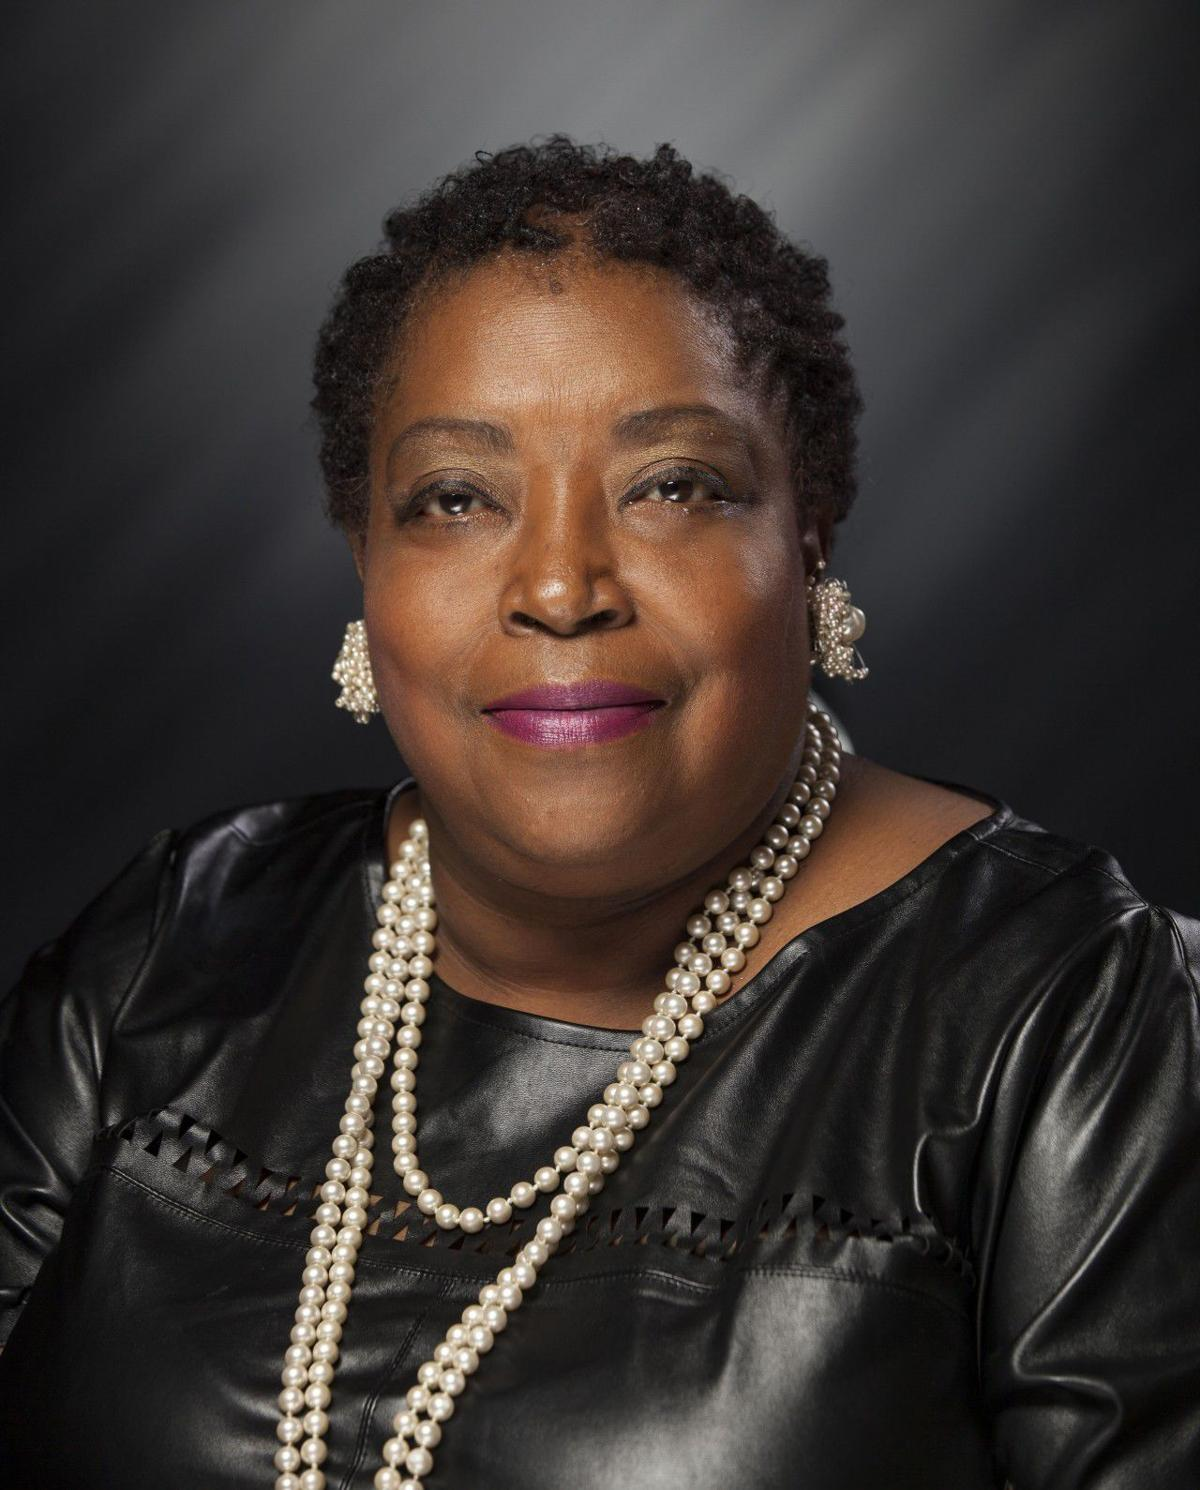 Rep. Vanessa Summers